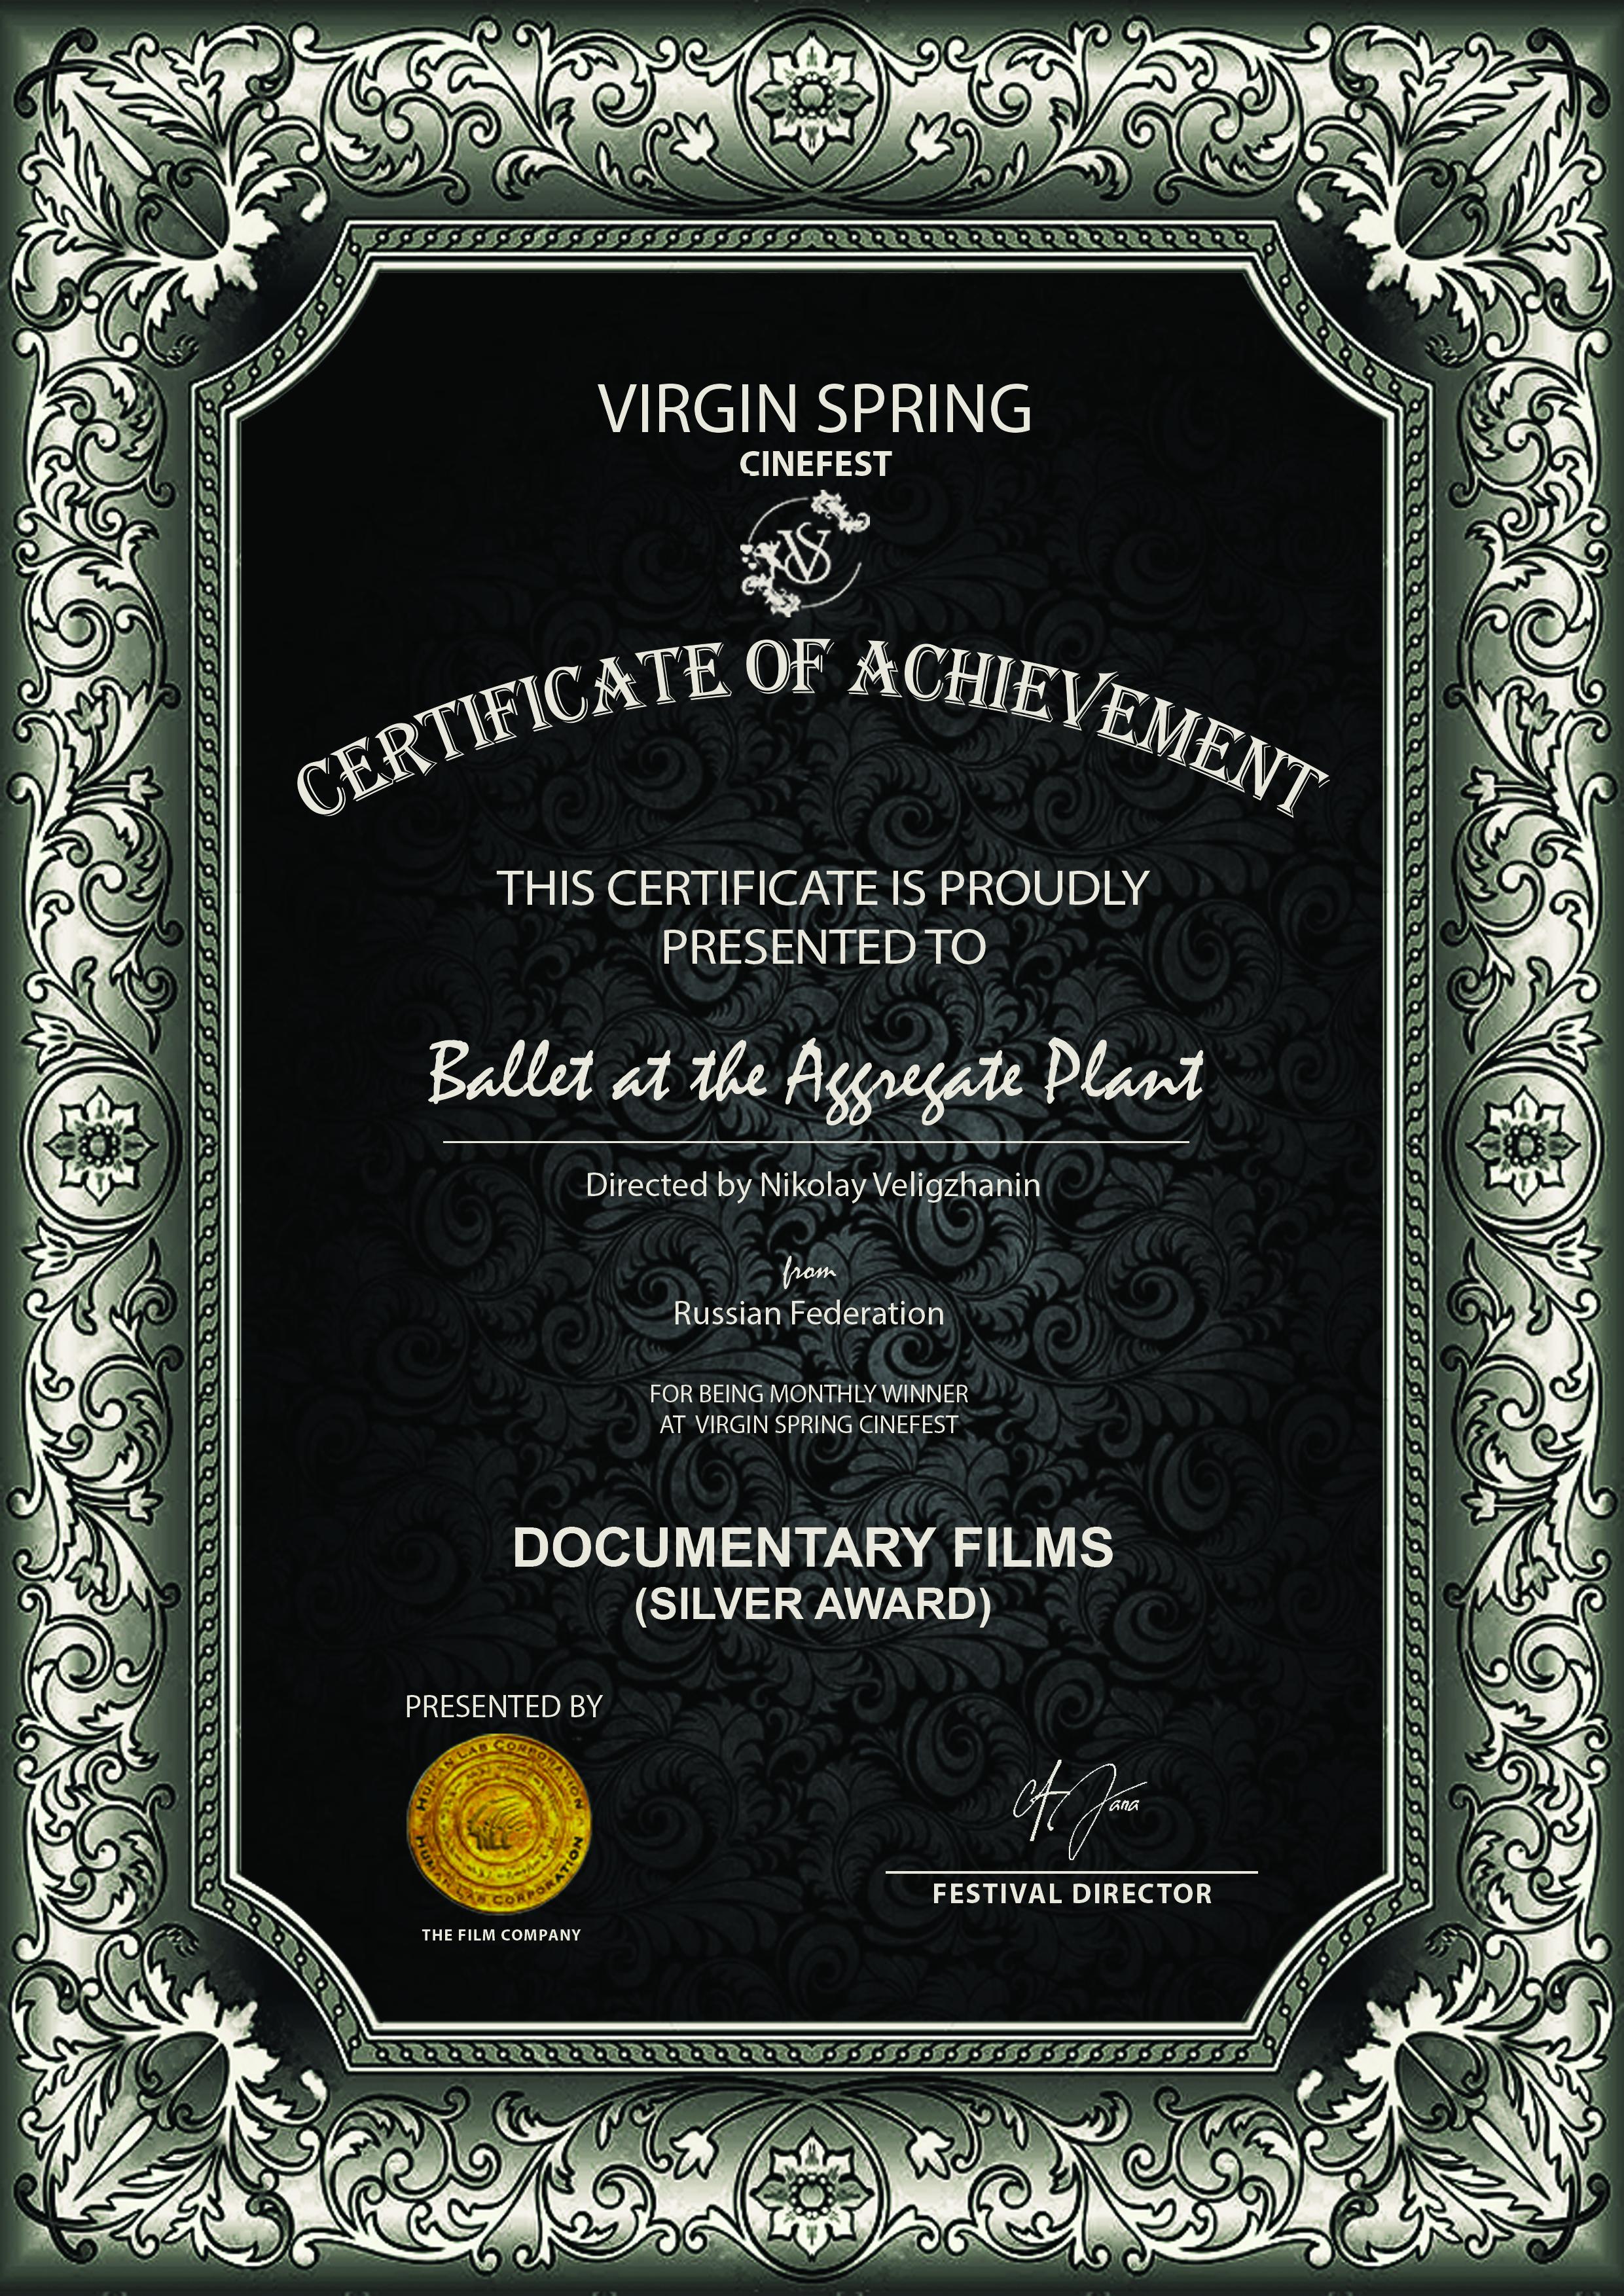 Virgin Spring Cinefest